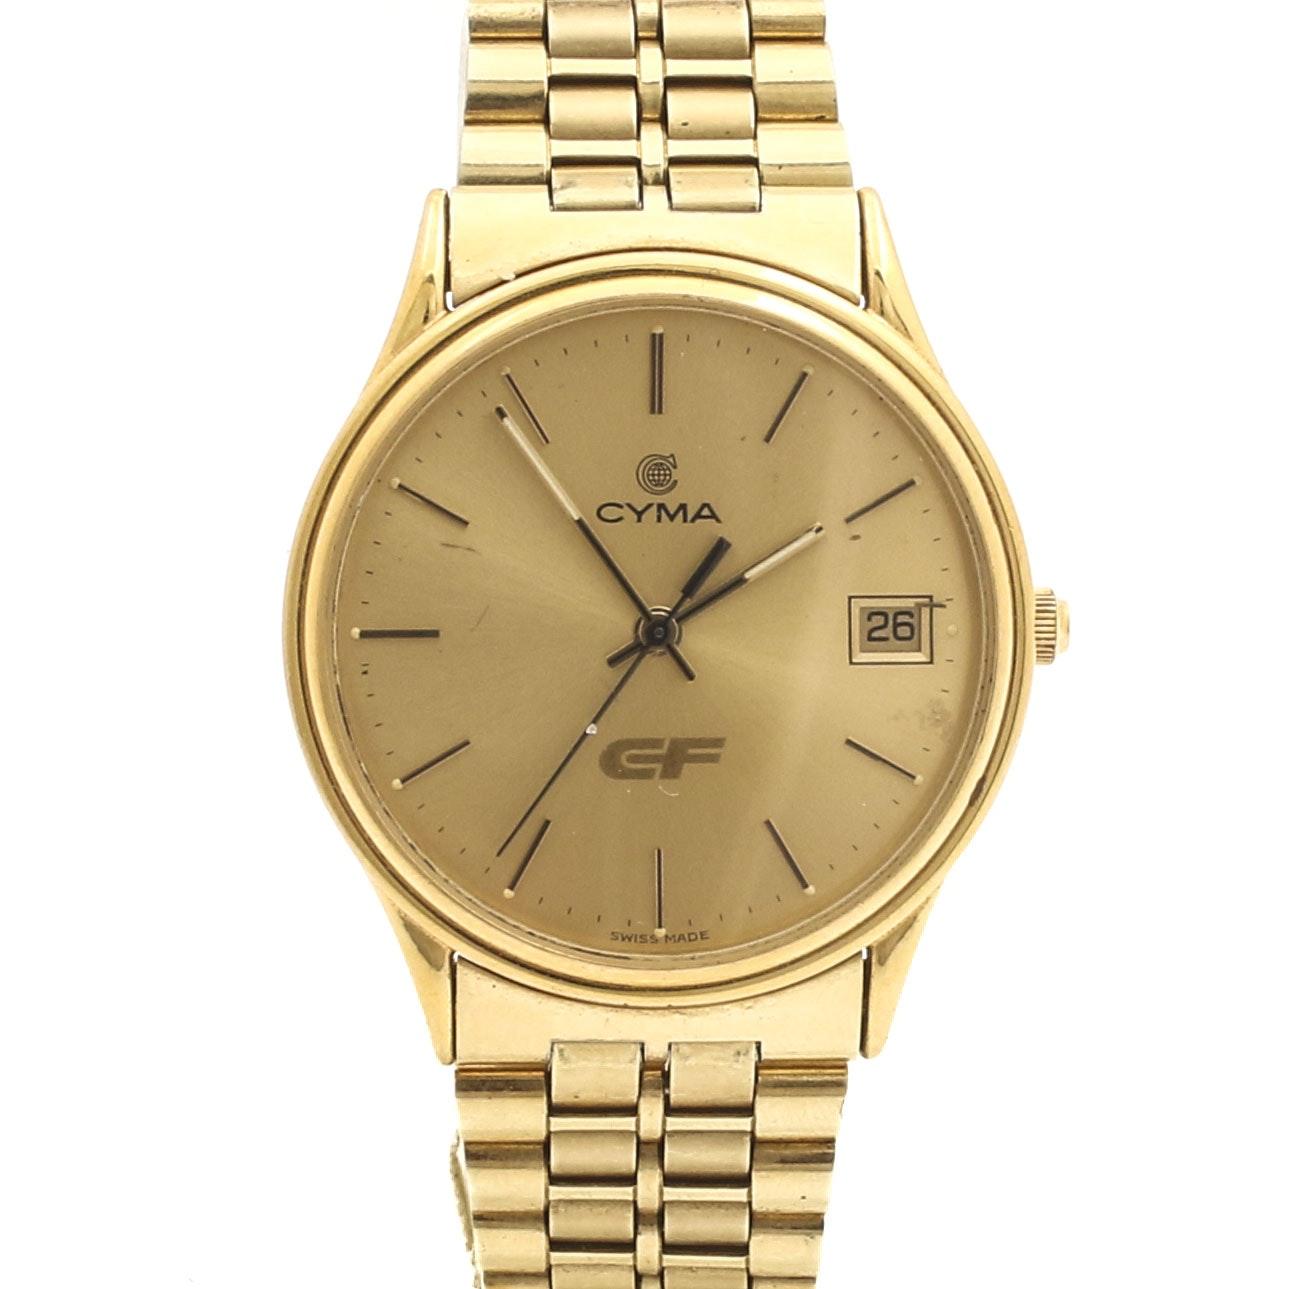 Cyma CF Gold-Tone Wristwatch